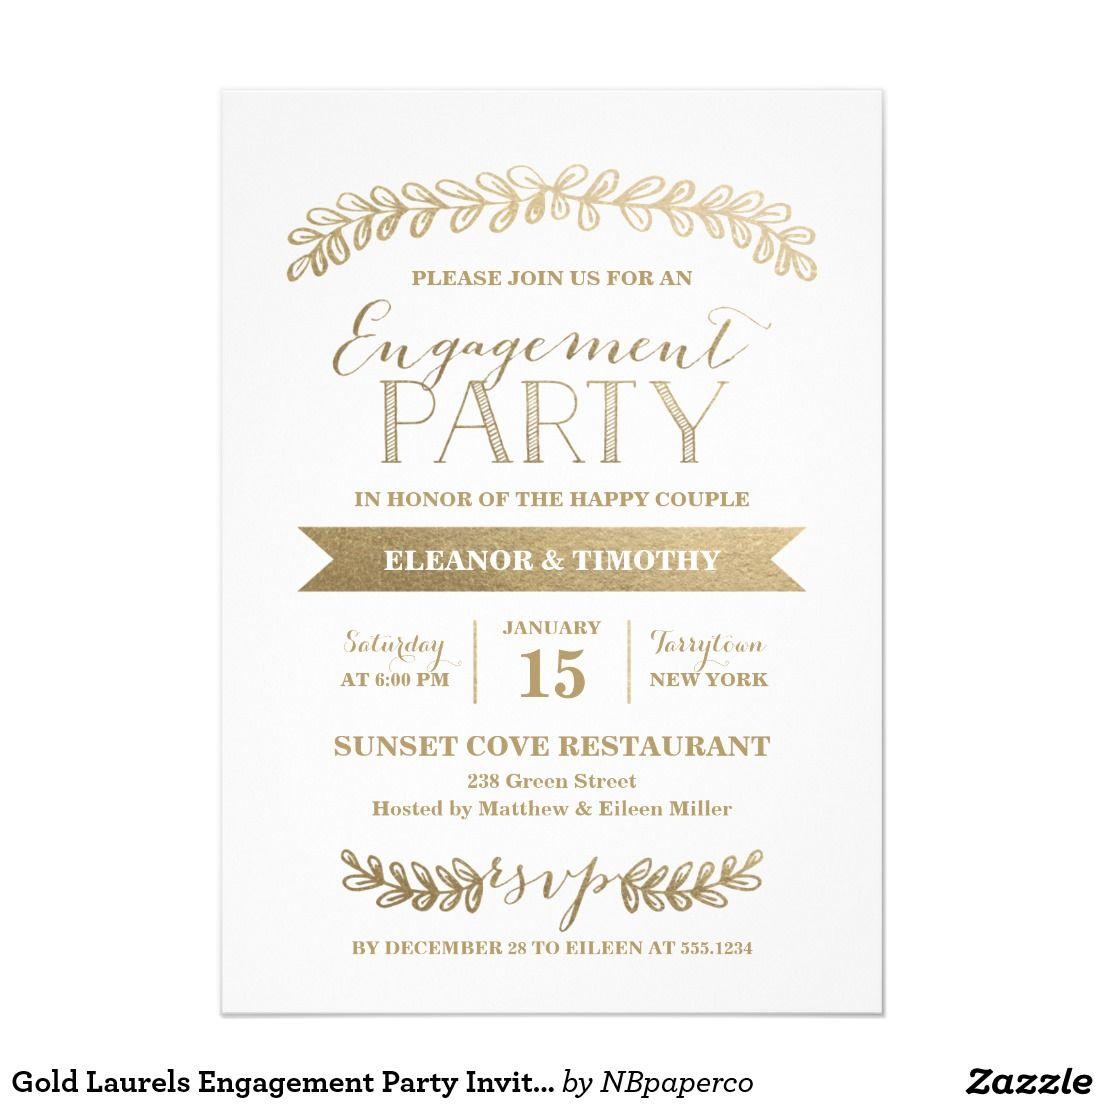 Gold Laurels Engagement Party Invitation | Wedding :Engagement Party ...